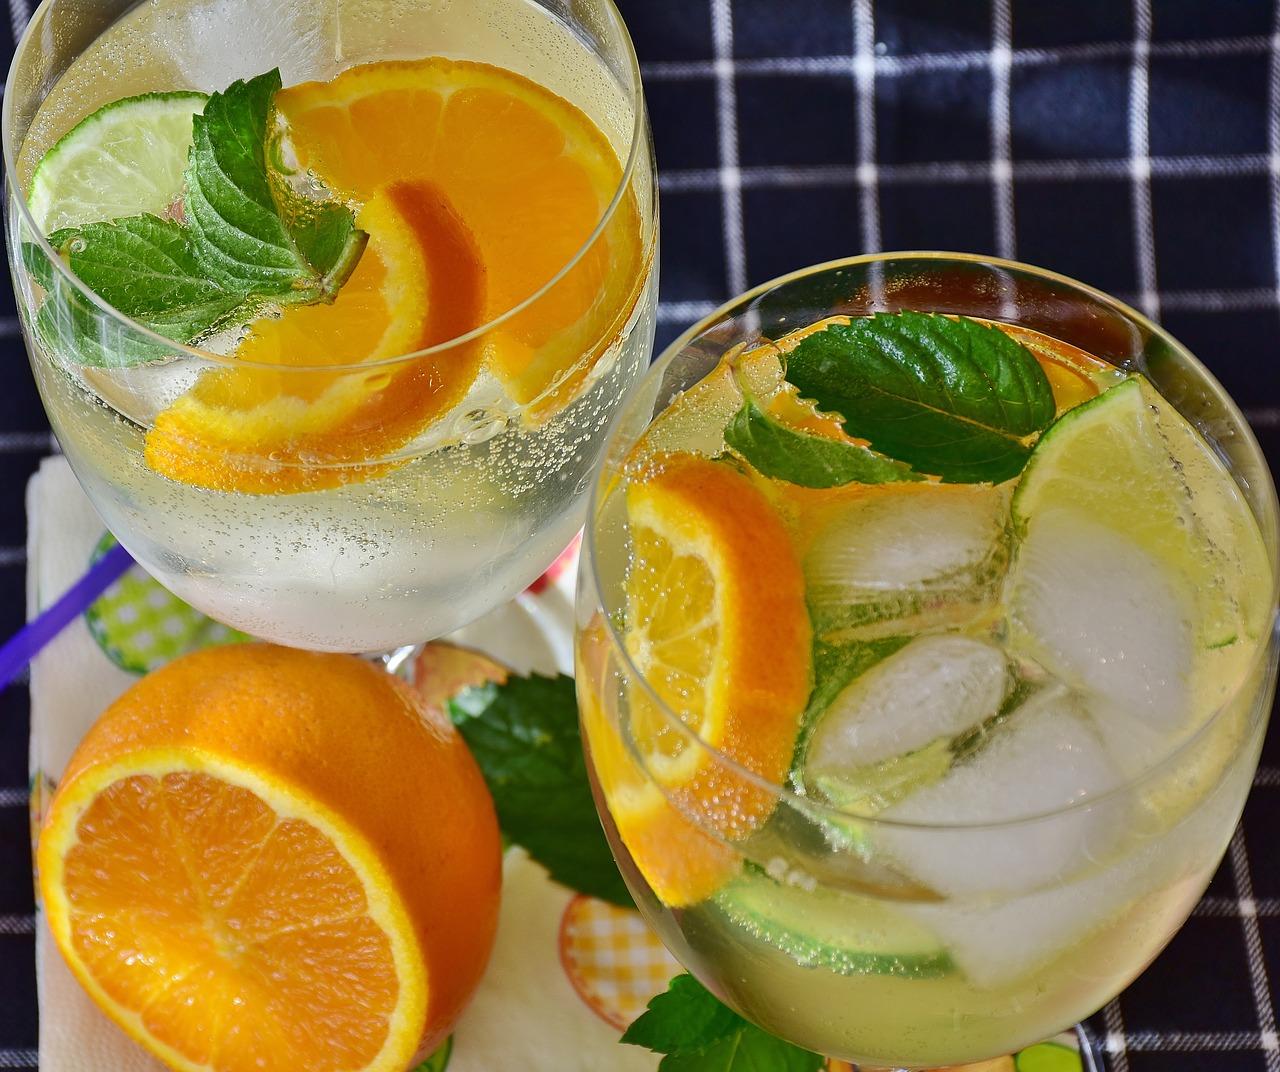 cocktail-2387066_1280.jpg